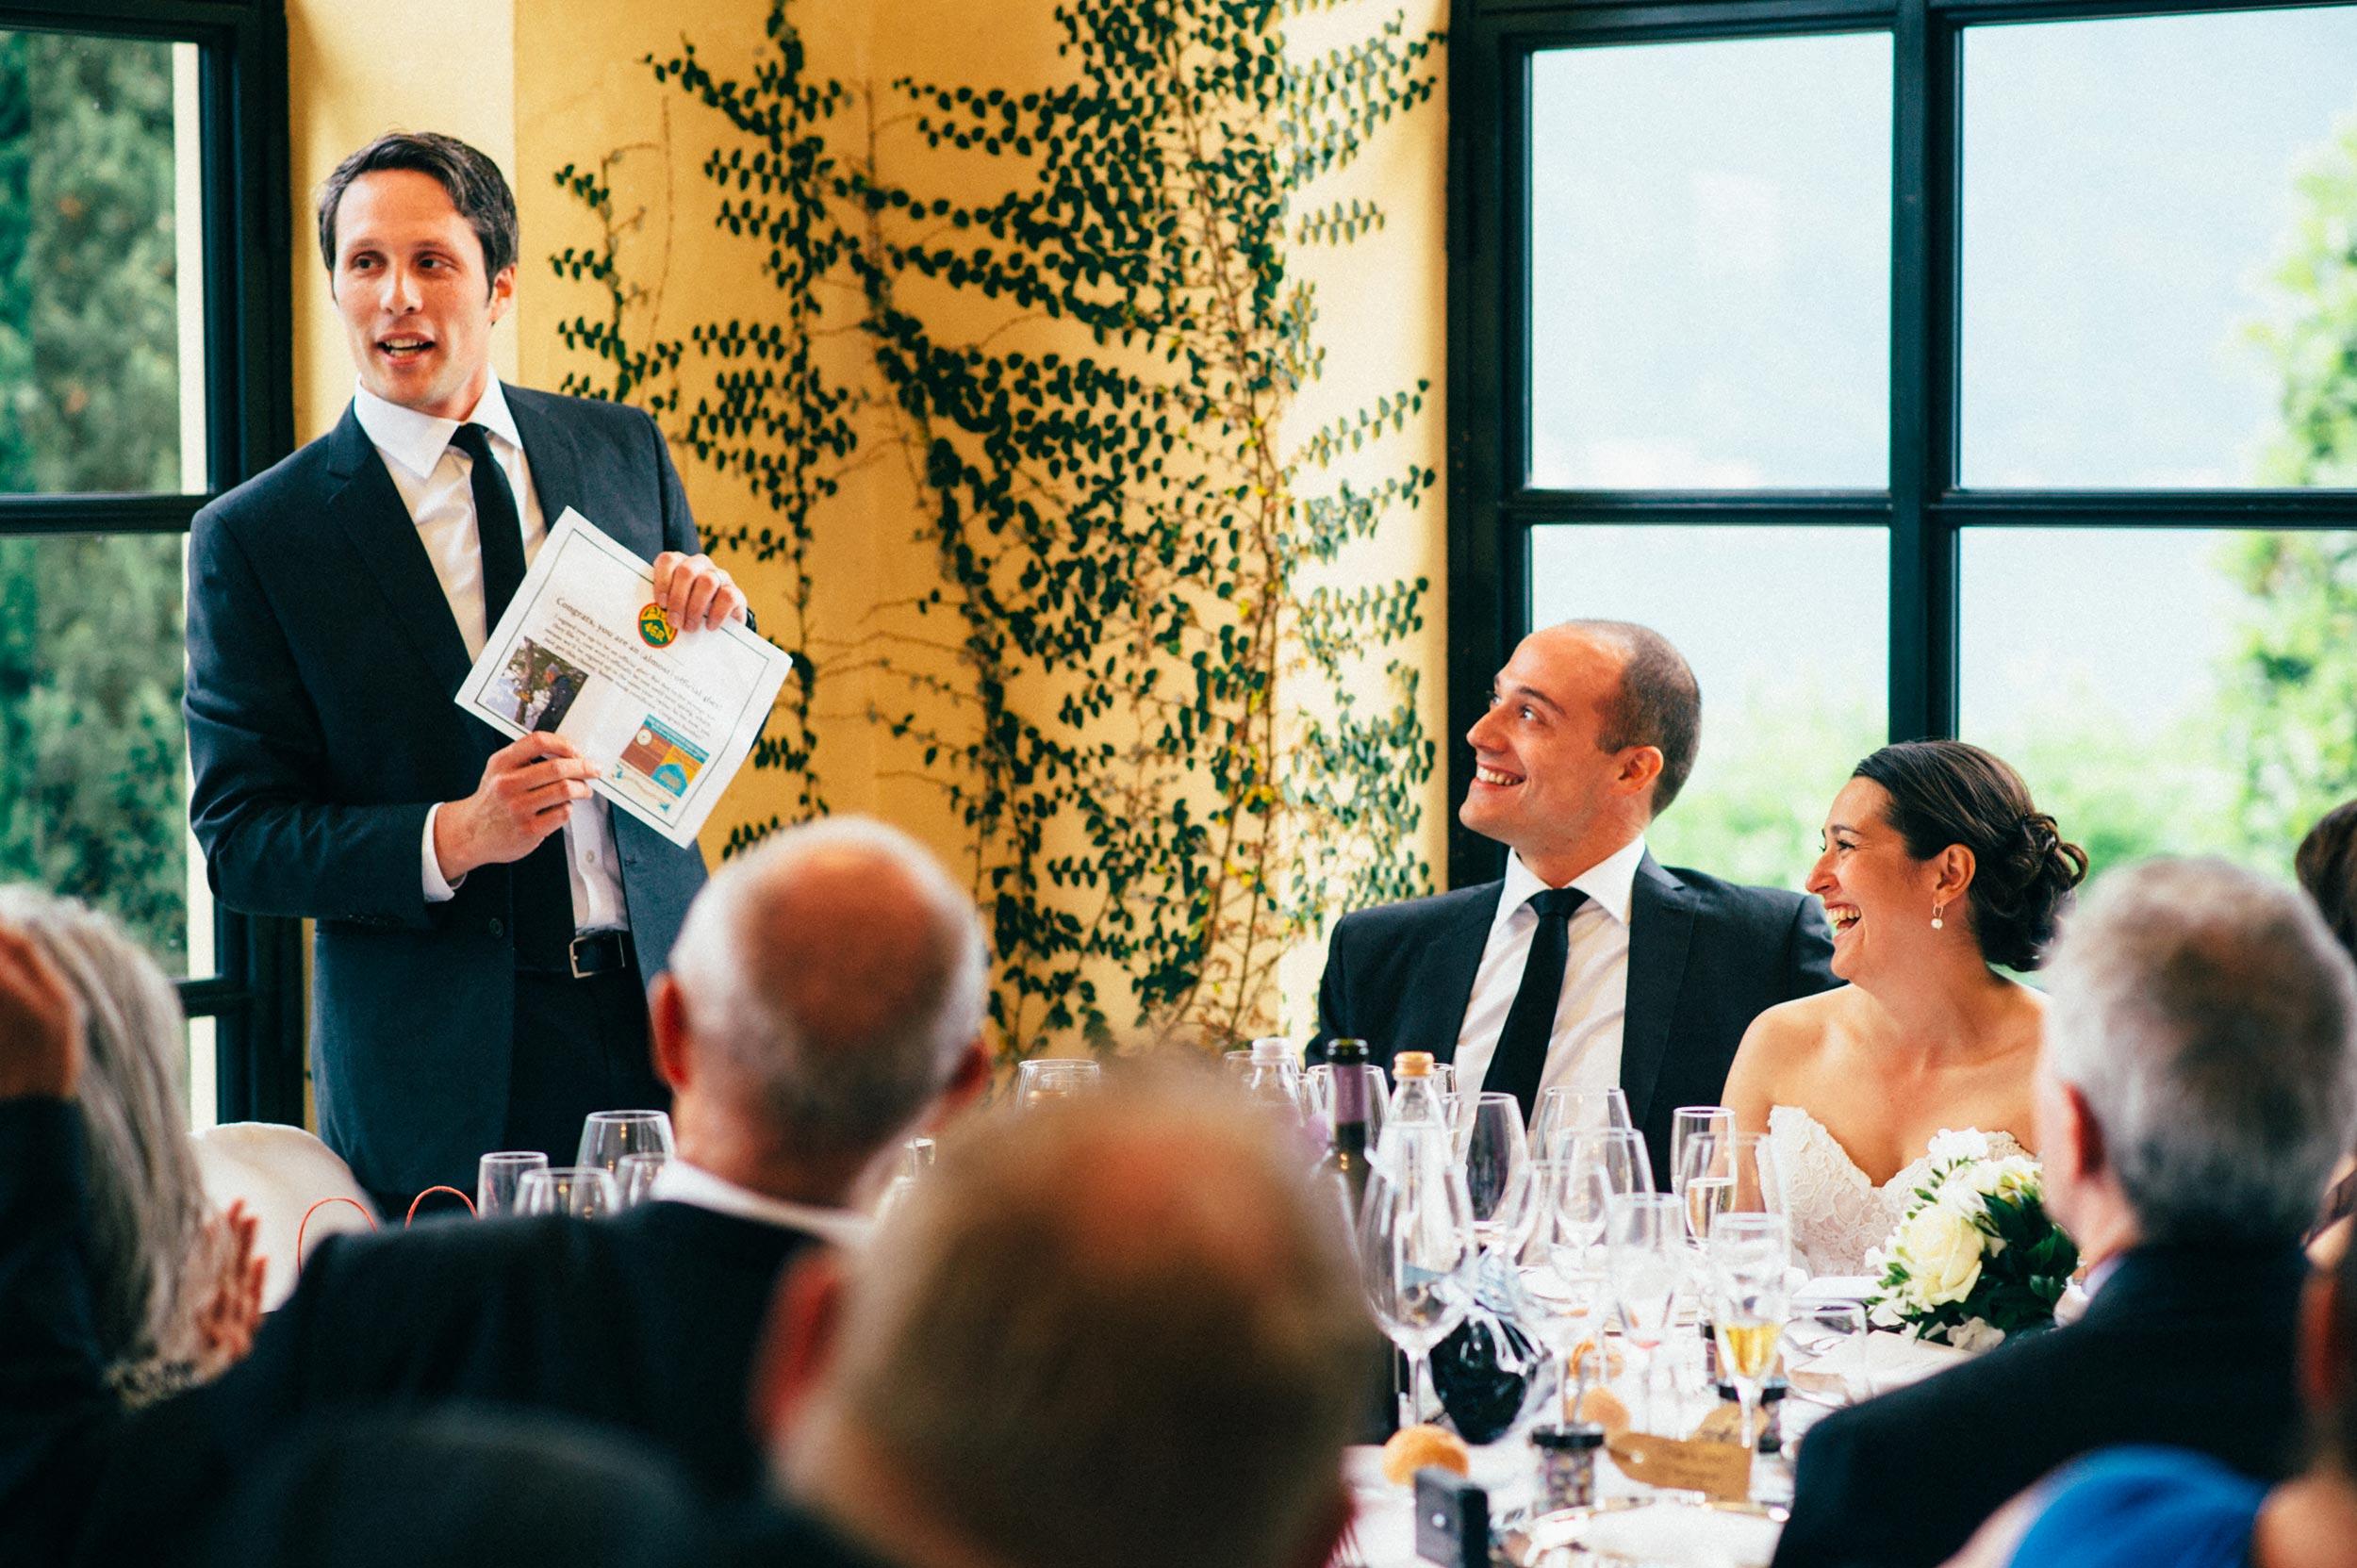 2015-Jon-Lauren-Bellagio-Lake-Como-Wedding-Photographer-Italy-Alessandro-Avenali-43.jpg